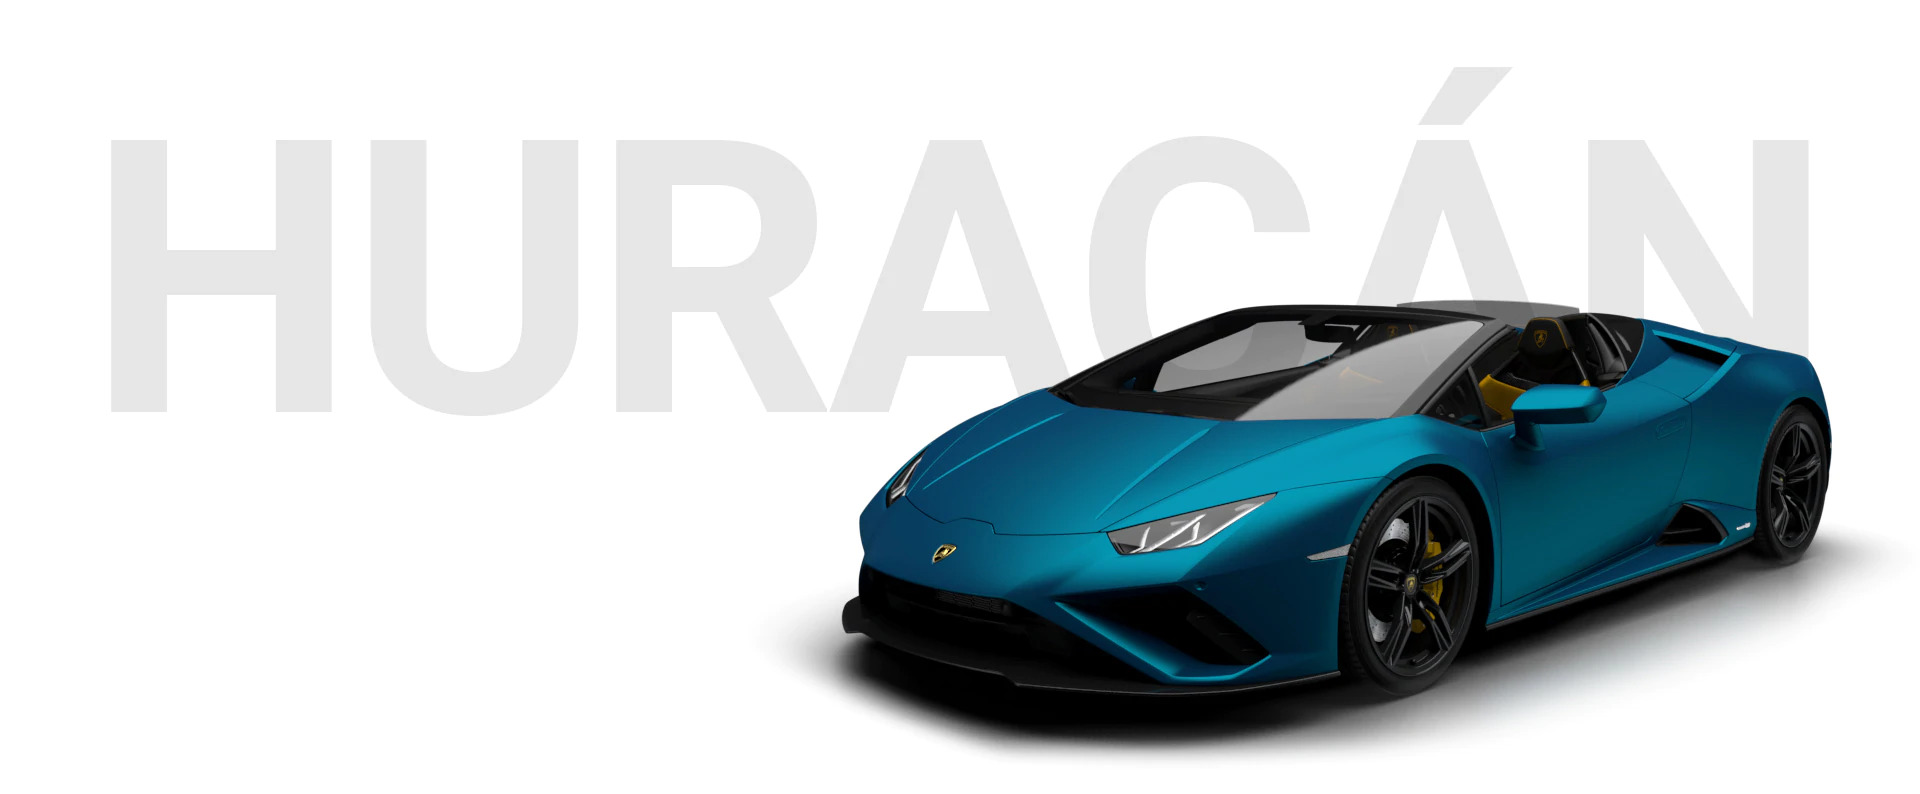 Lamborghini Huracán EVO RDW Spyder